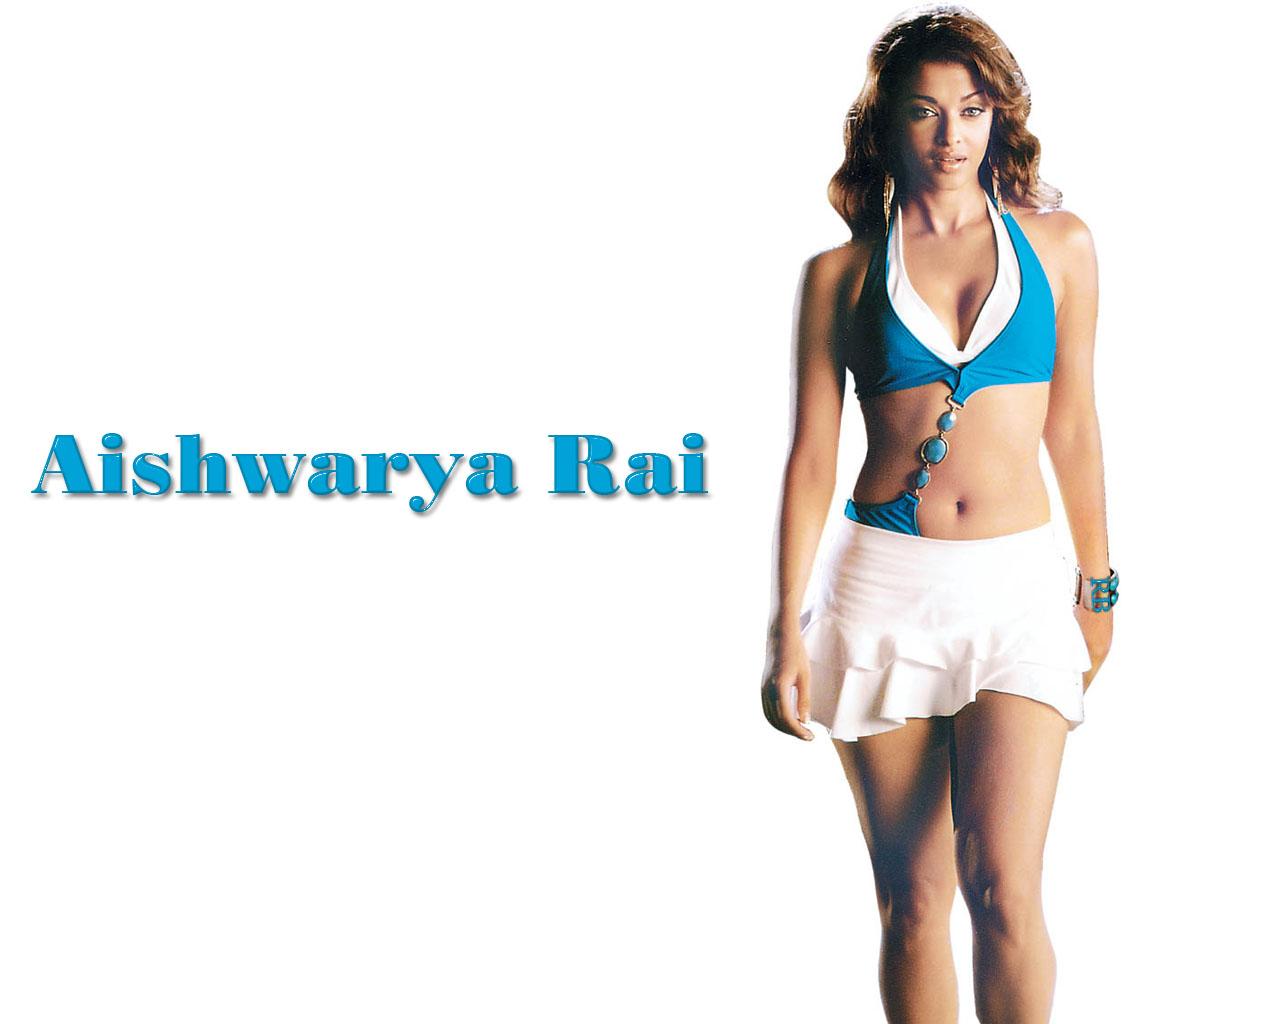 http://4.bp.blogspot.com/-6Jw1Q86zfdo/TZ9YuIuerzI/AAAAAAAAAZw/zxLom2Z1Fm8/s1600/Aishwarya-rai-in-dhoom-2-IV.jpg